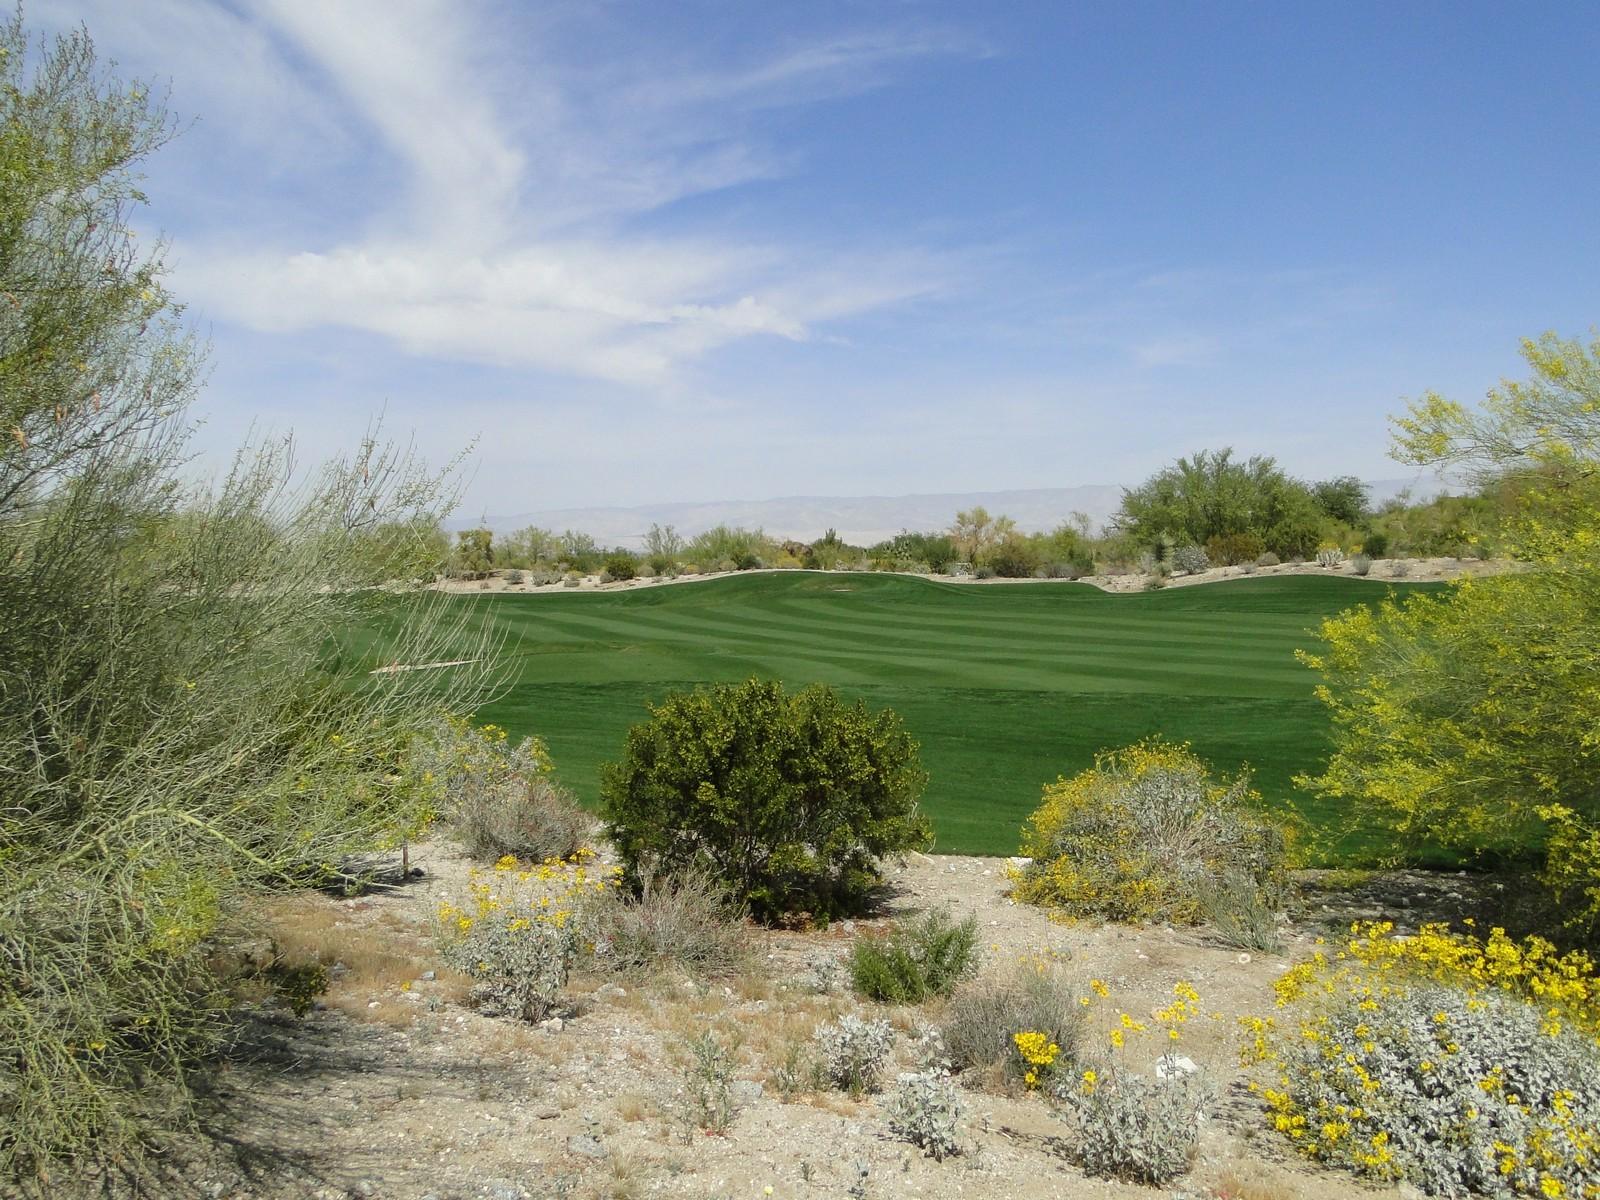 Terreno per Vendita alle ore 73934 Desert Garden Trail Palm Desert, California, 92260 Stati Uniti